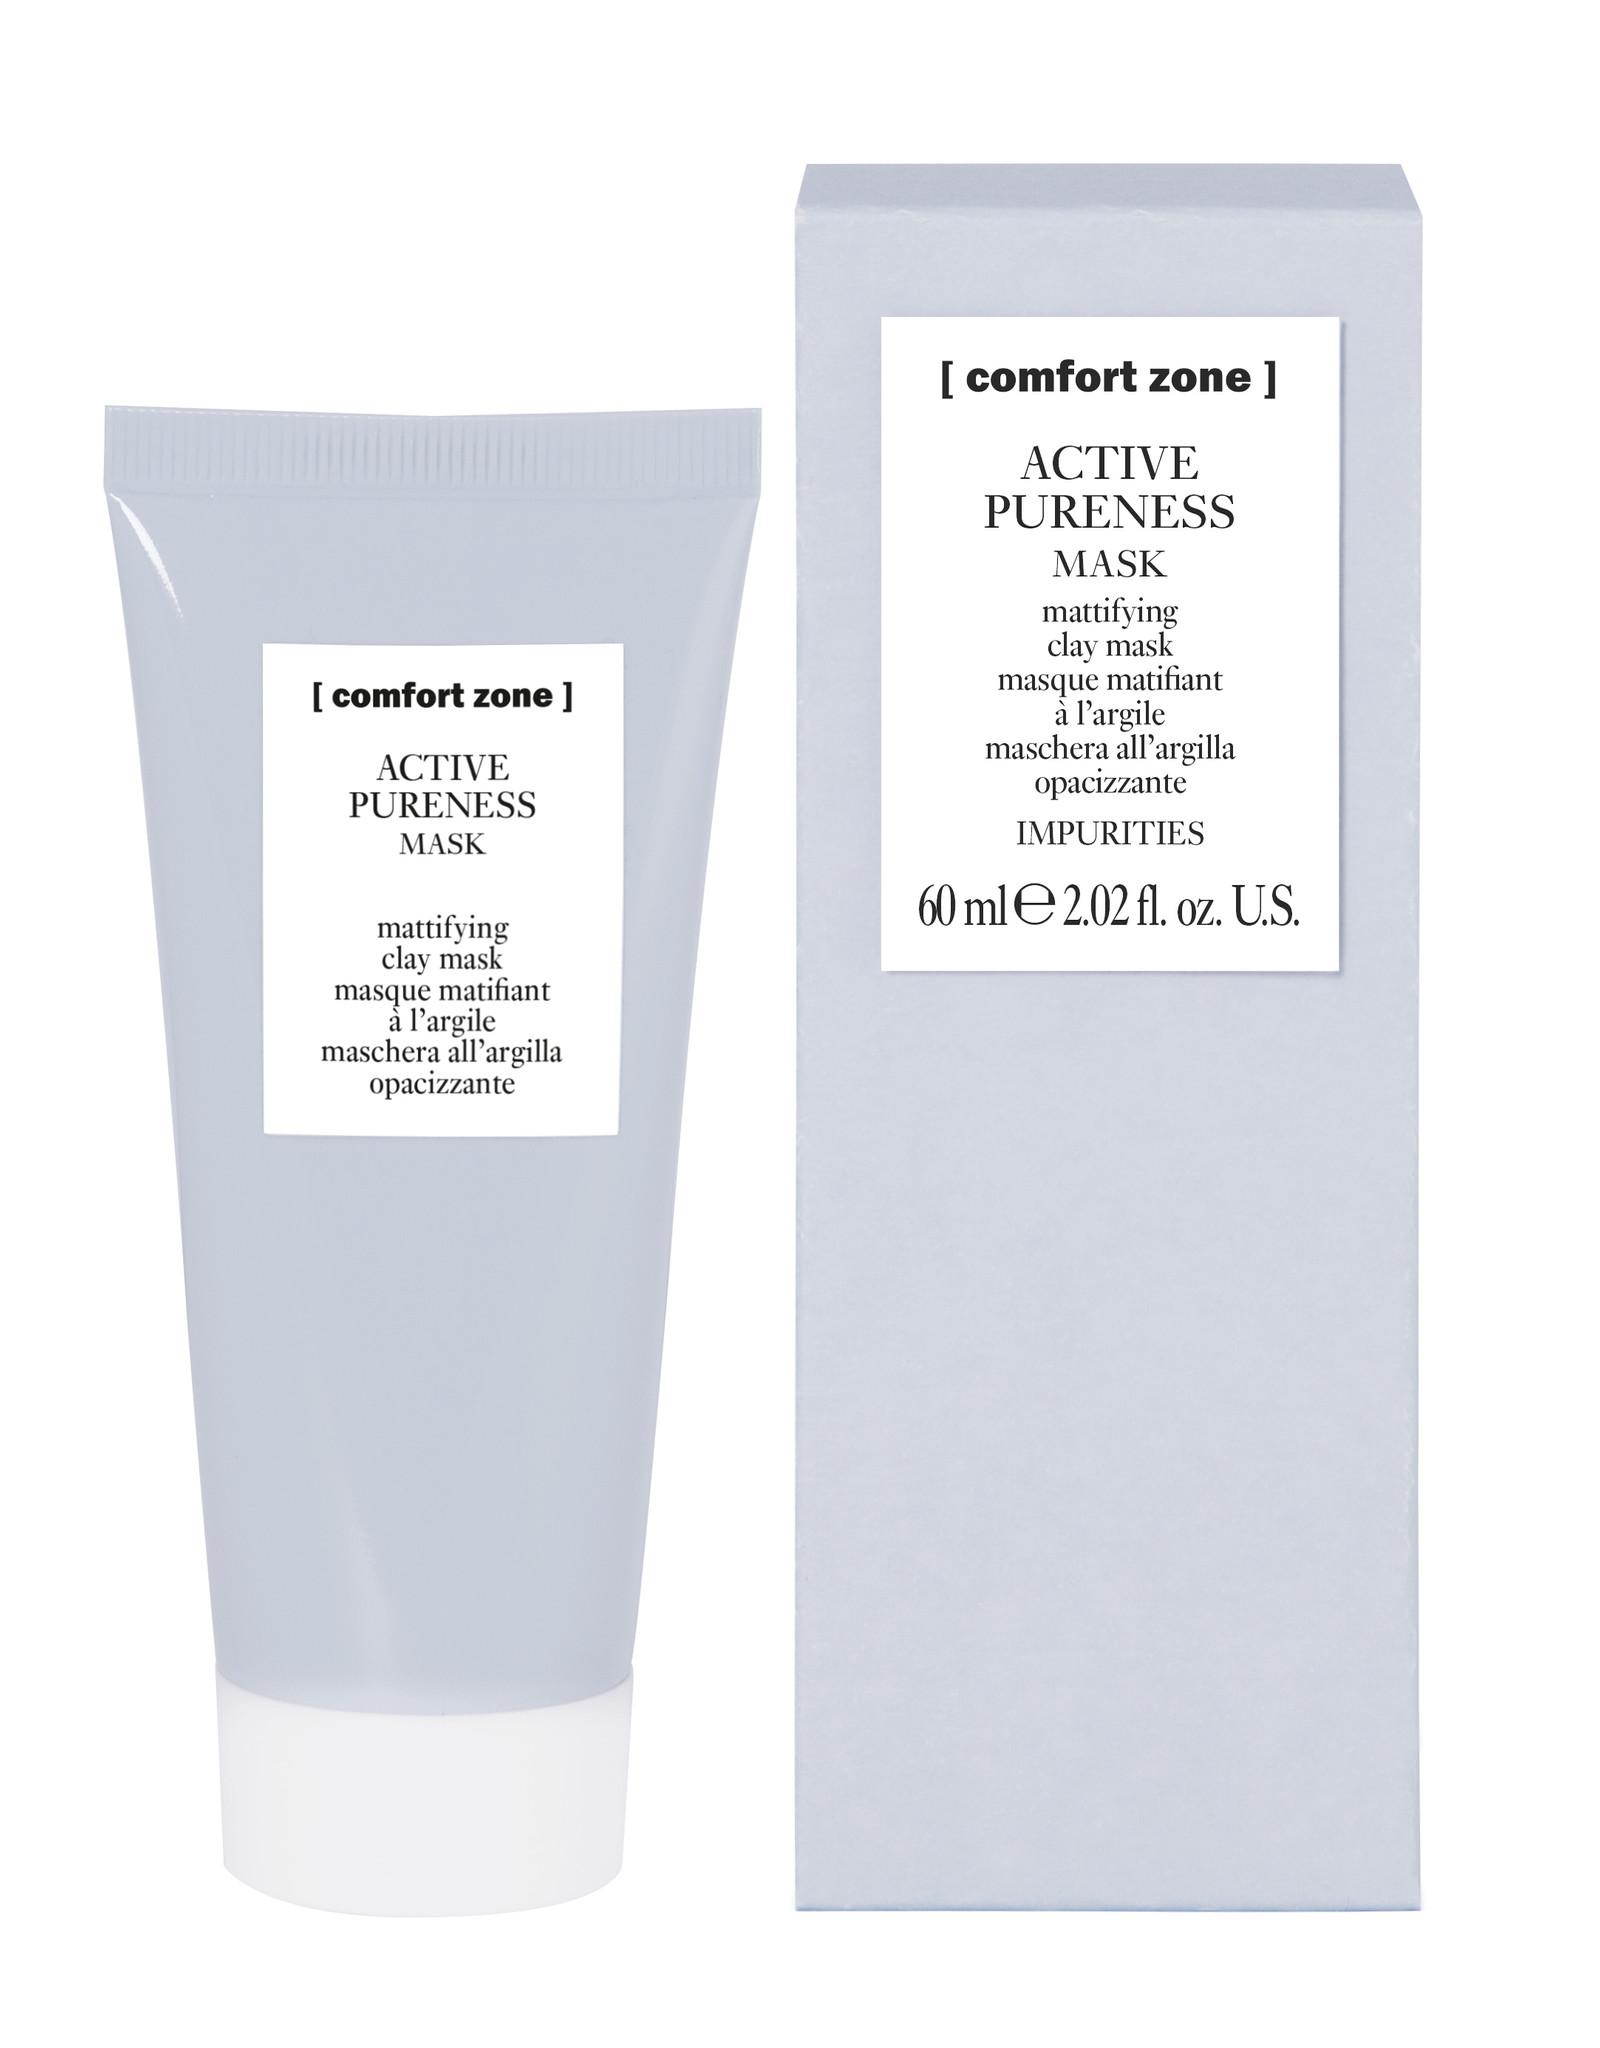 [Comfort Zone] Active Pureness Mask Tube 60 ml